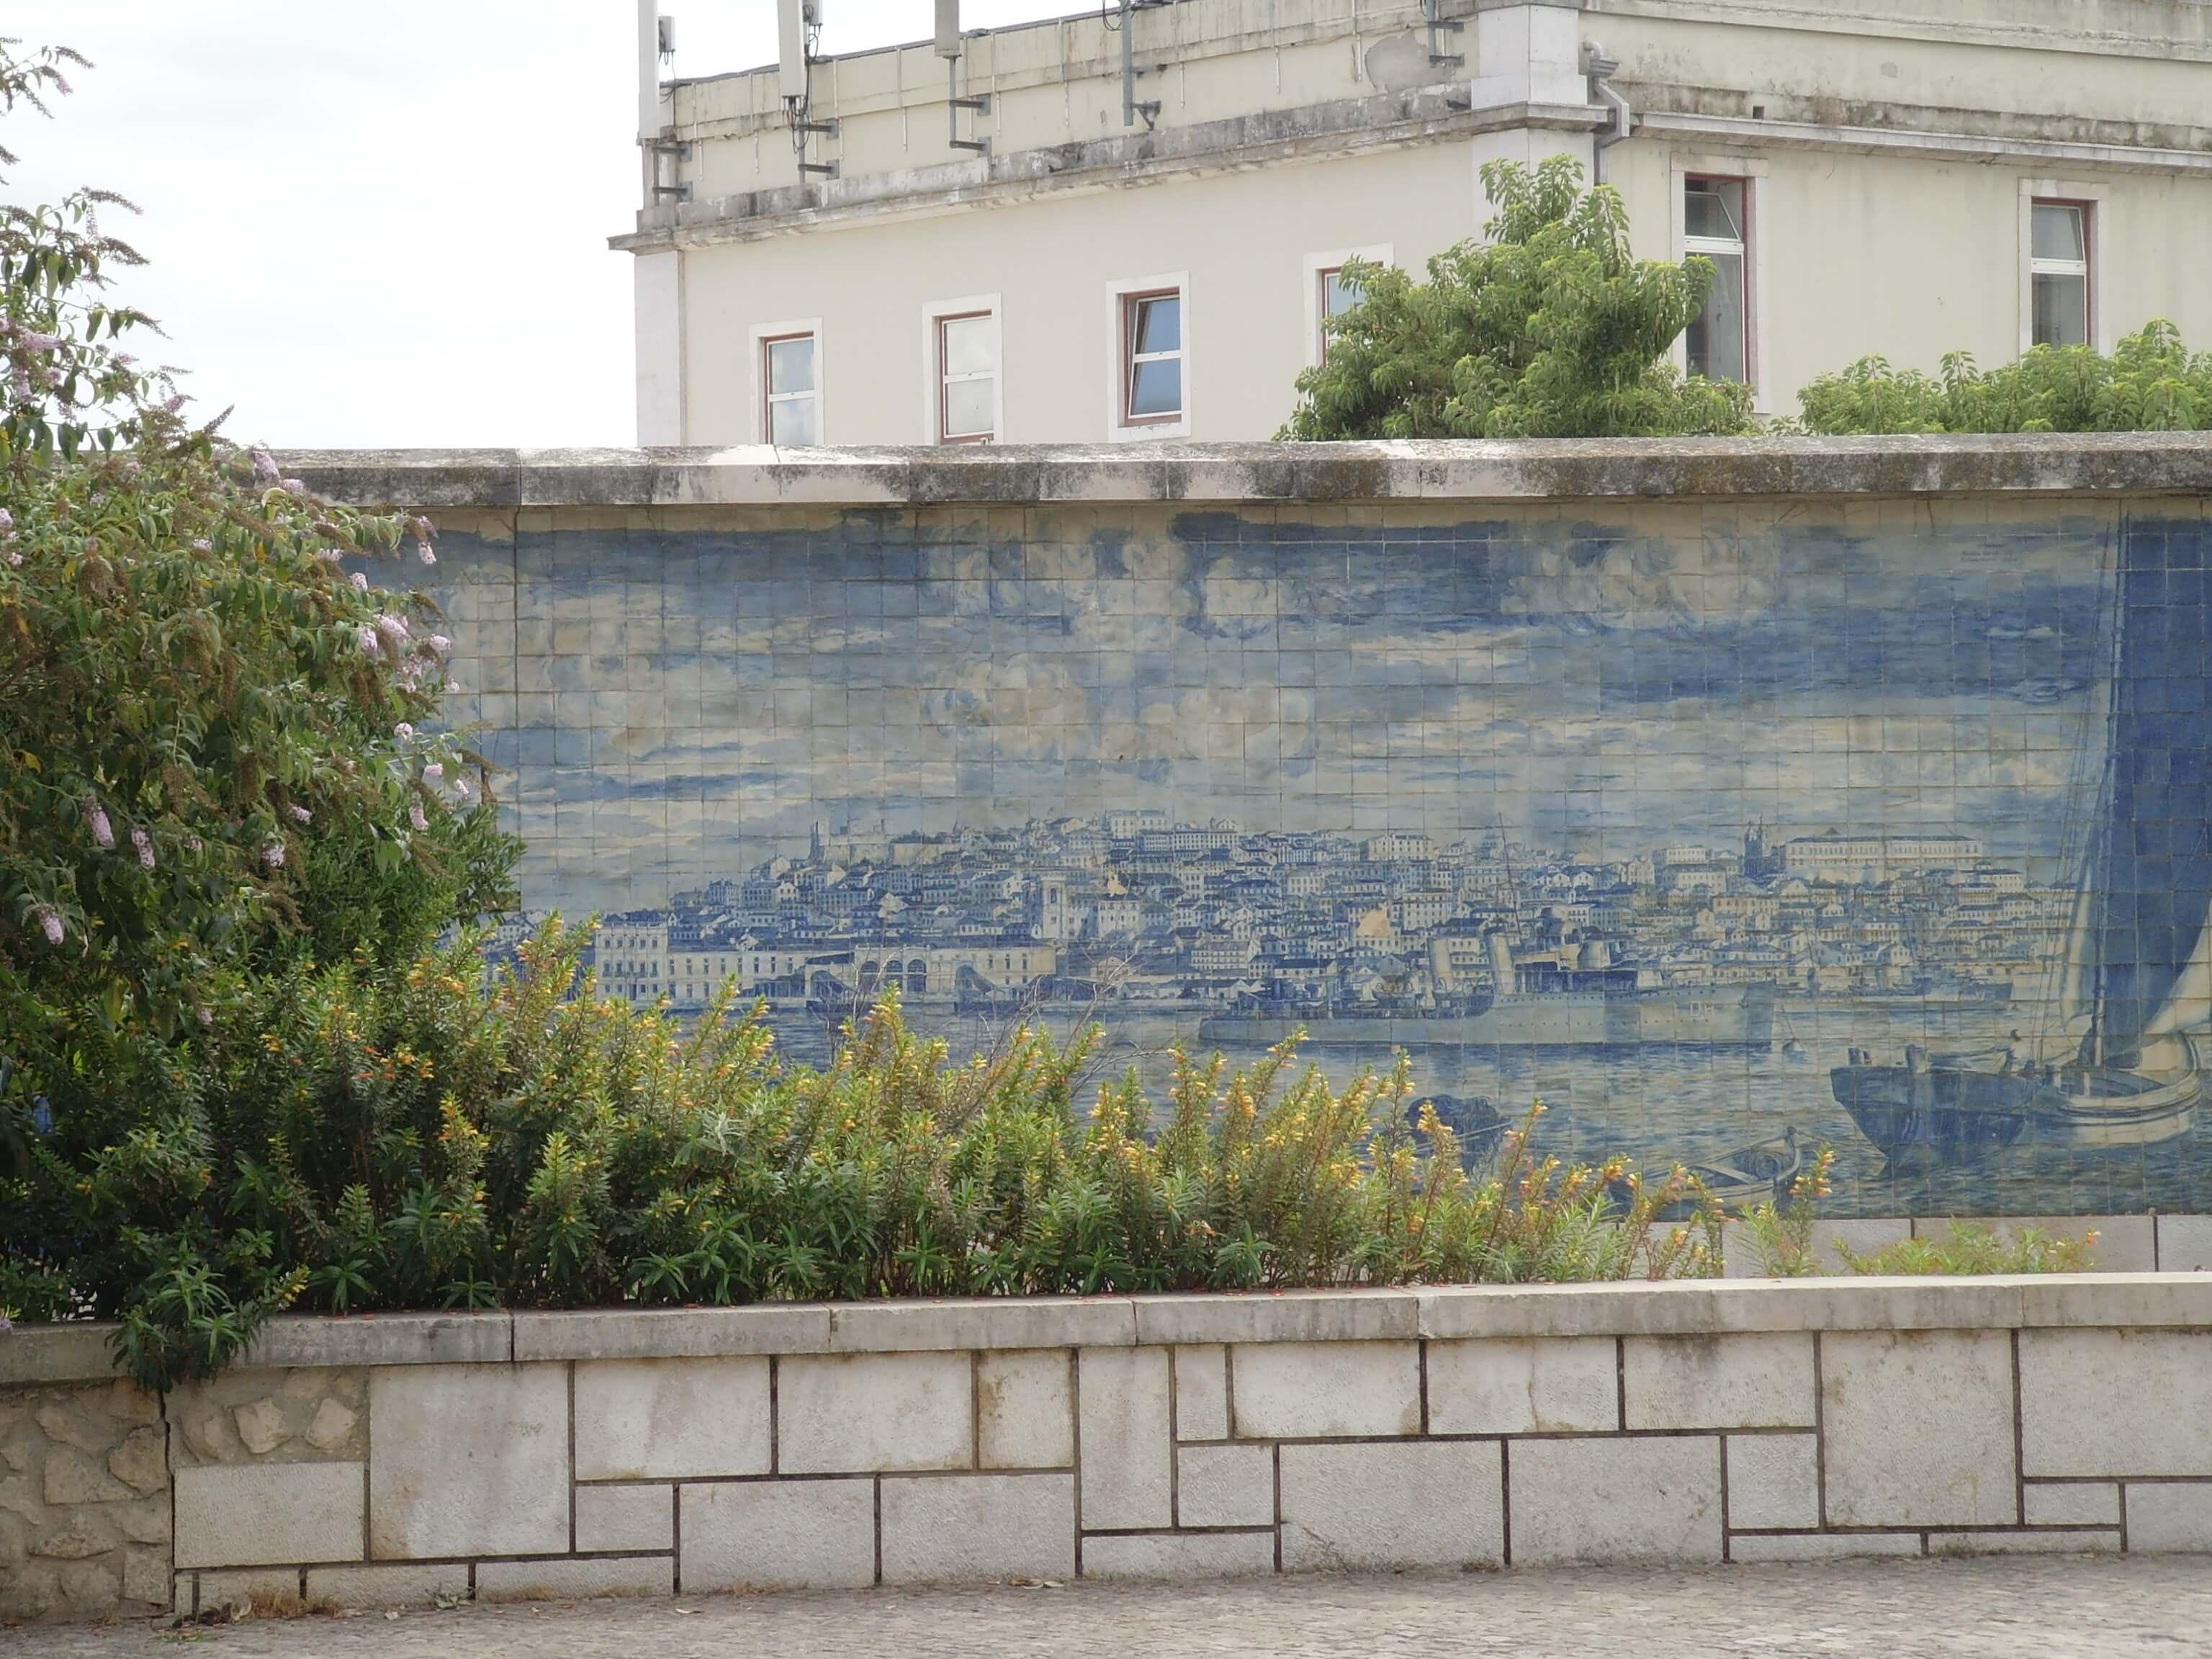 Rondreizen Portugal Lissabon mozaiek 2